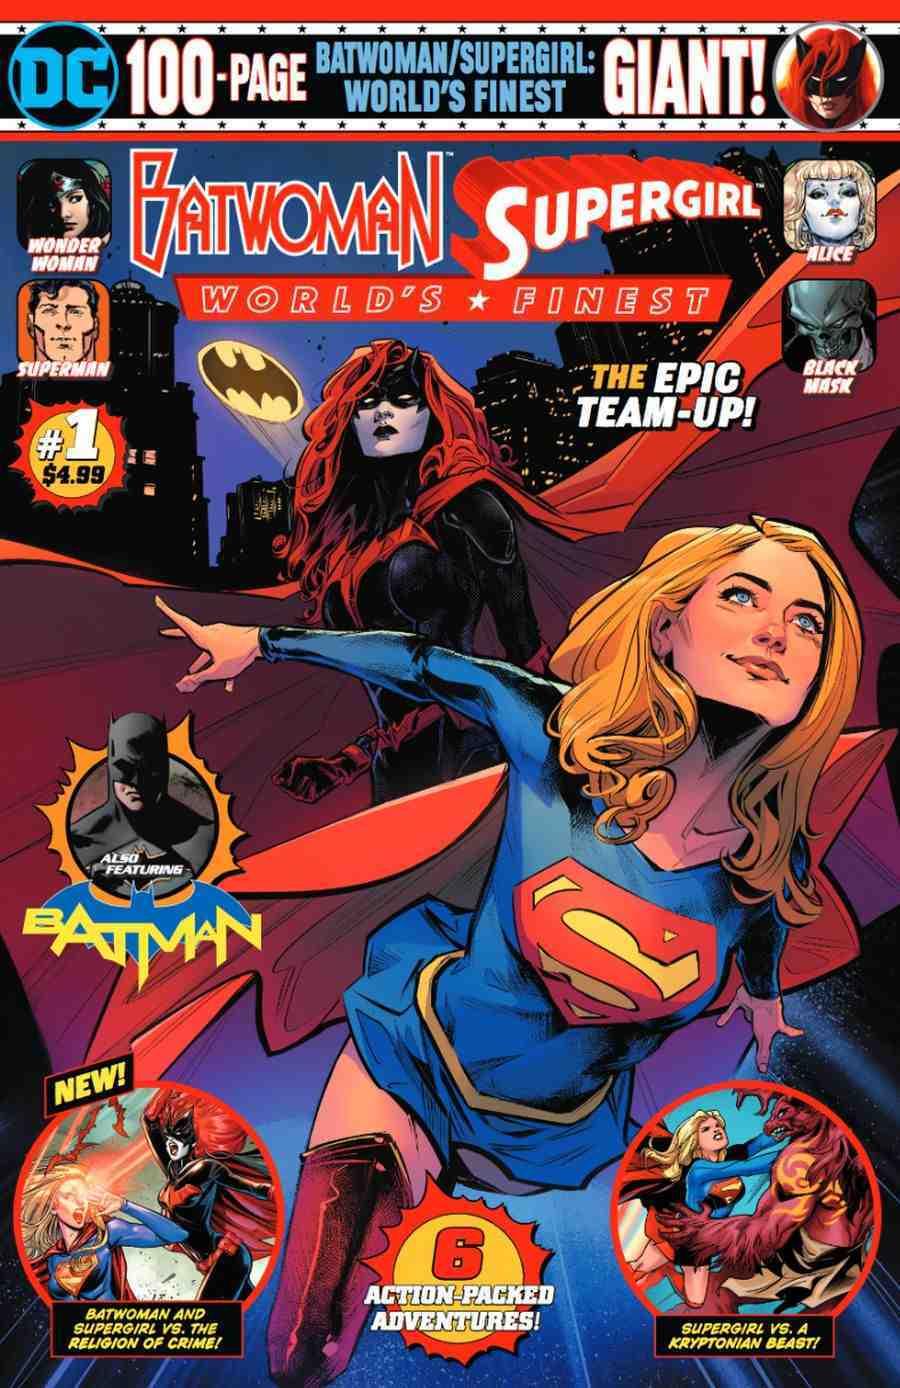 Batwoman Supergirl Worlds Finest Giant # 1